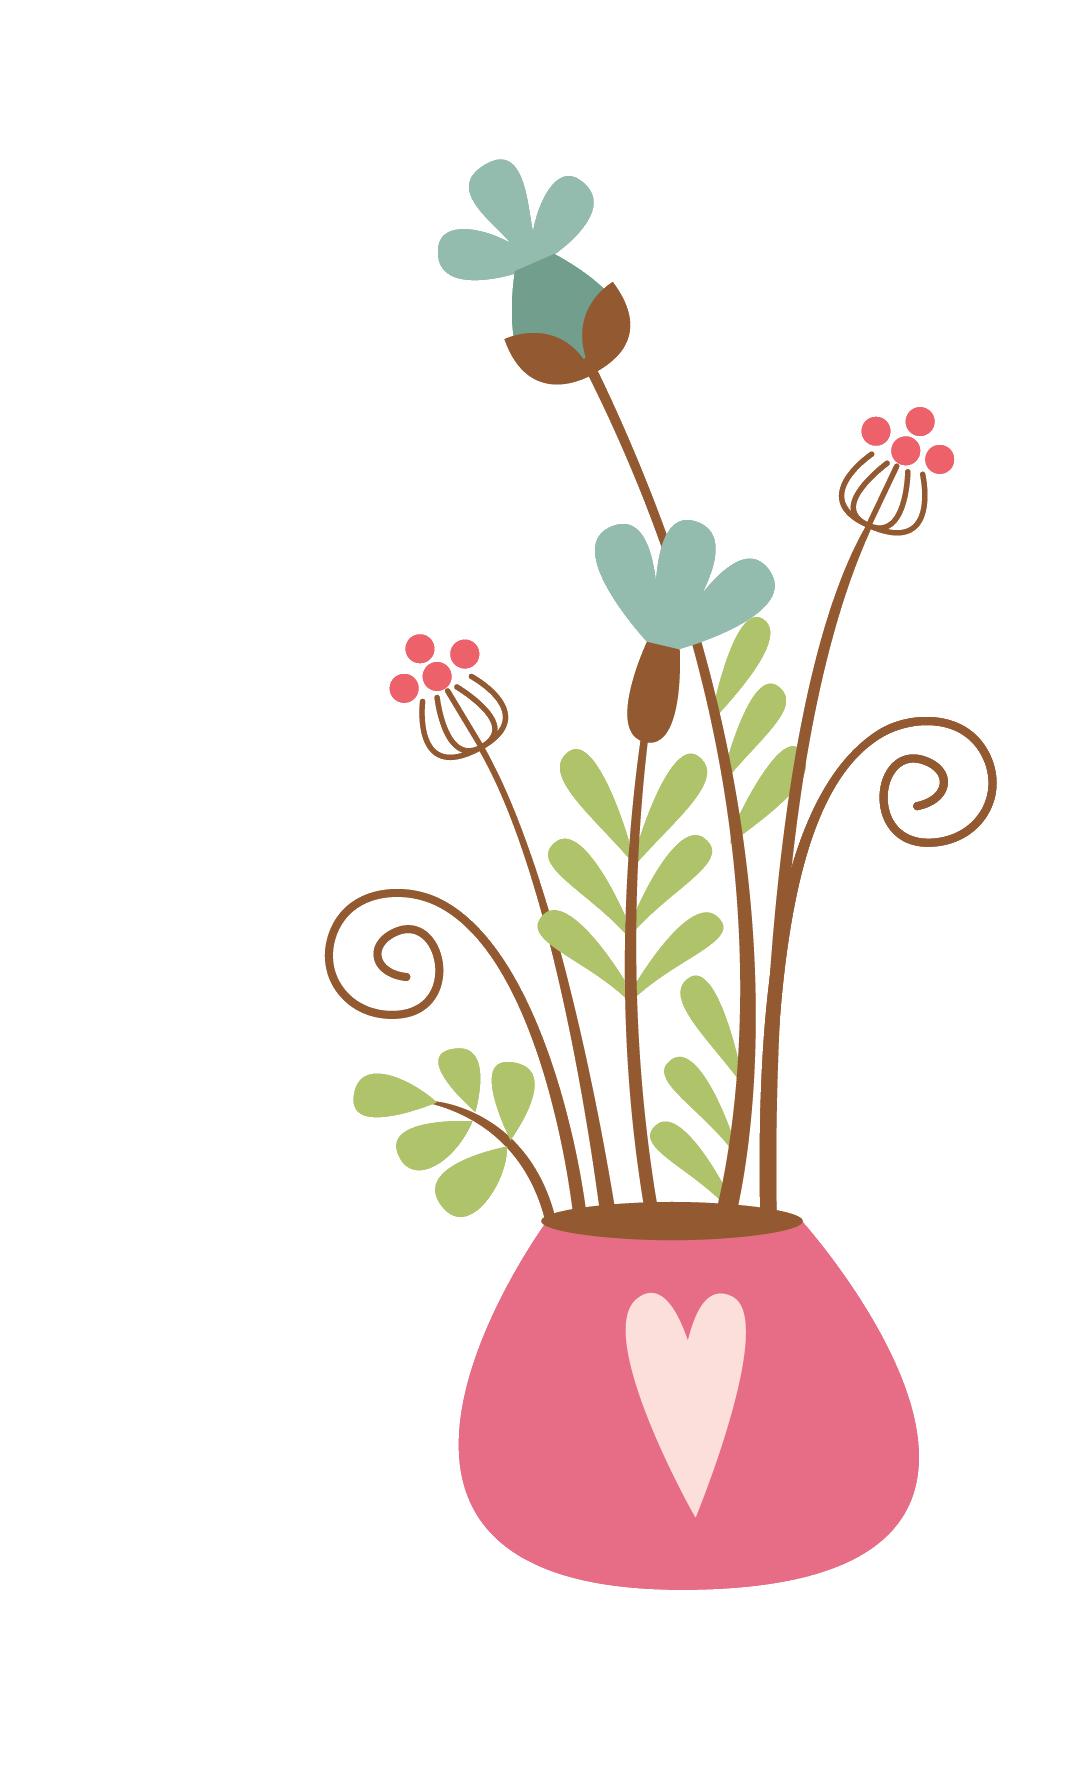 Flower vase clipart graphic freeuse stock u7530u5c3eu82b3u9999u73abu7470u5712 Flower Vase Florero Decorative ... graphic freeuse stock